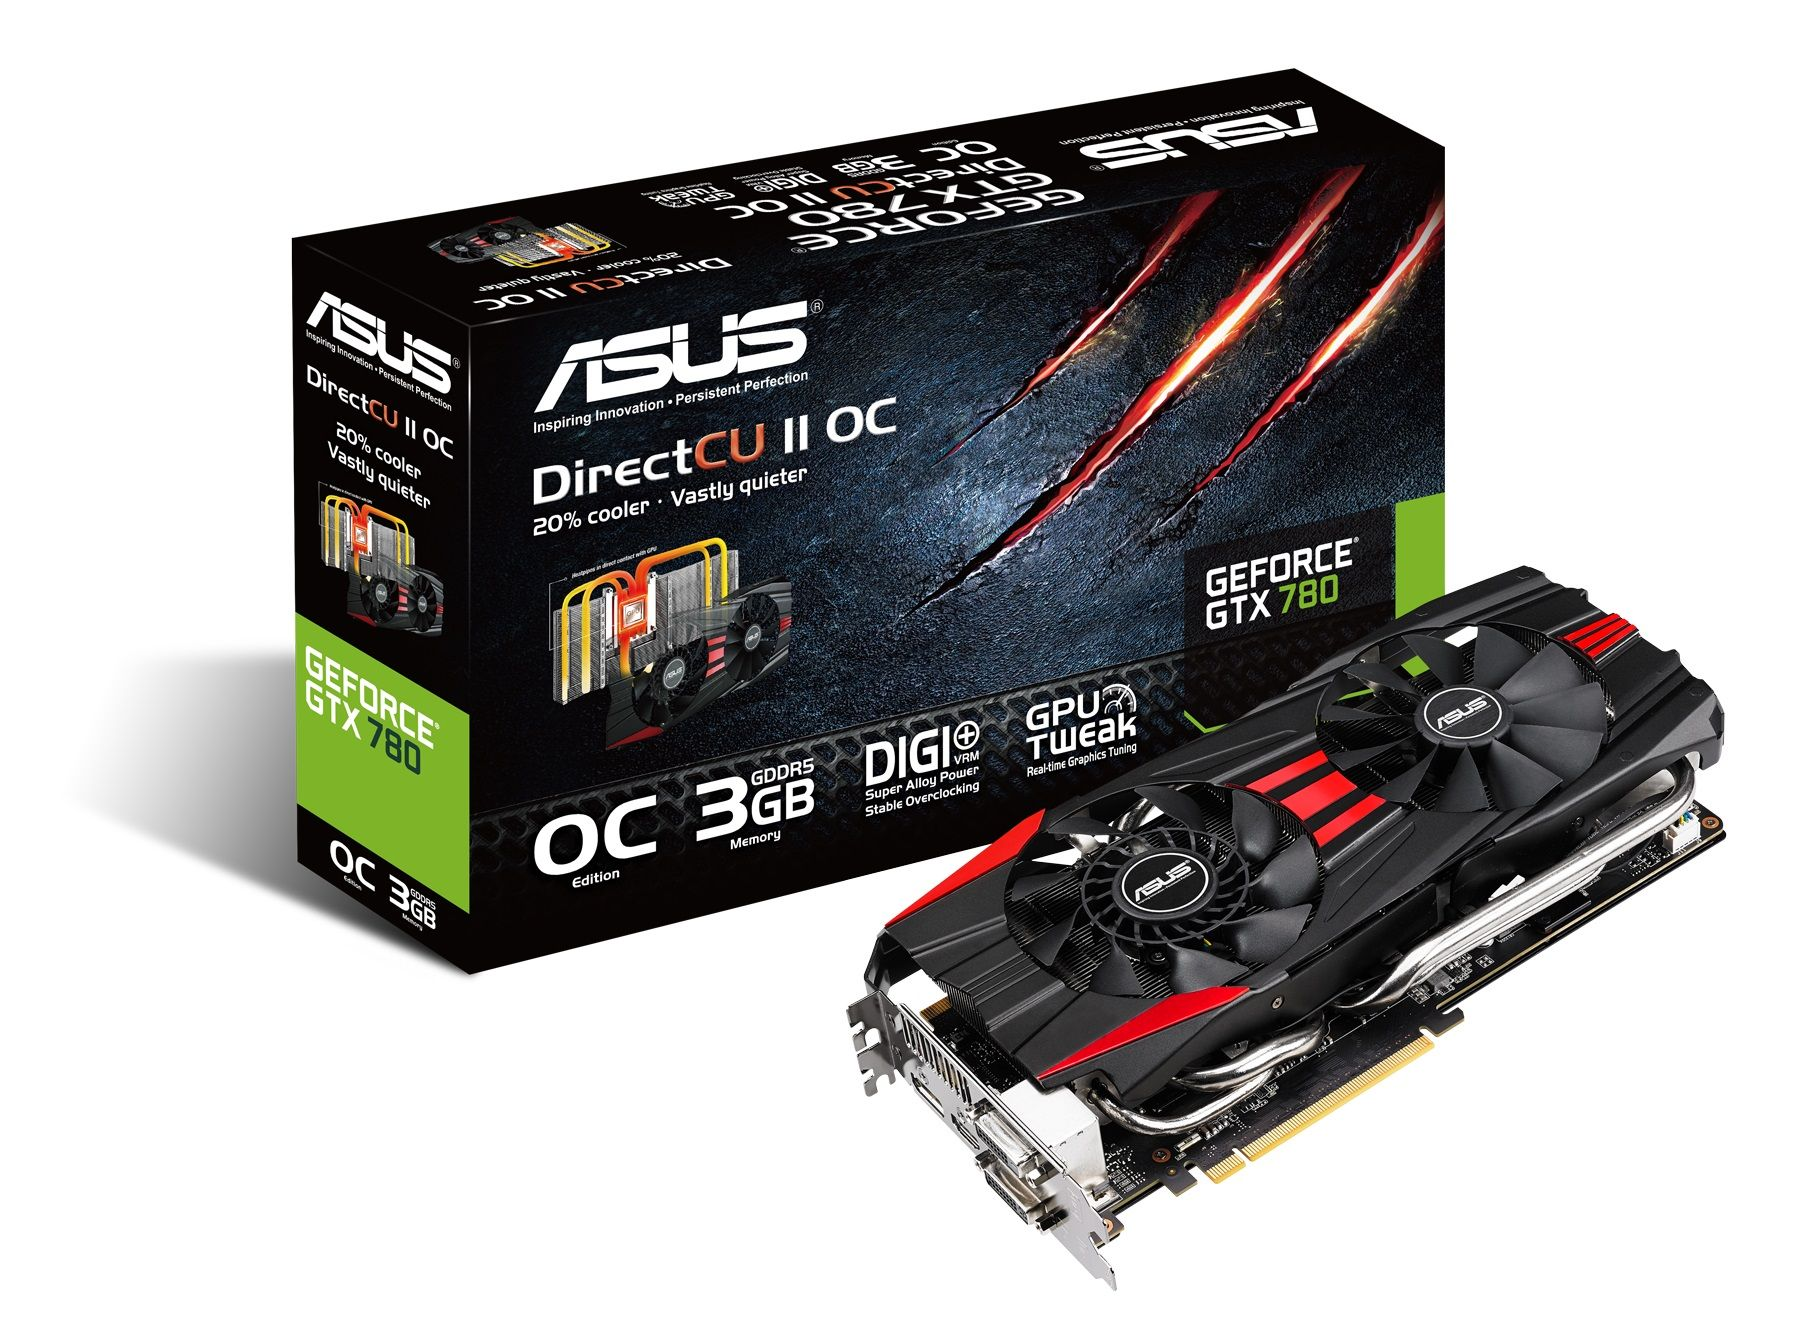 GeForce GTX 780 3GB GDDR5 384bits * Game Grátis *